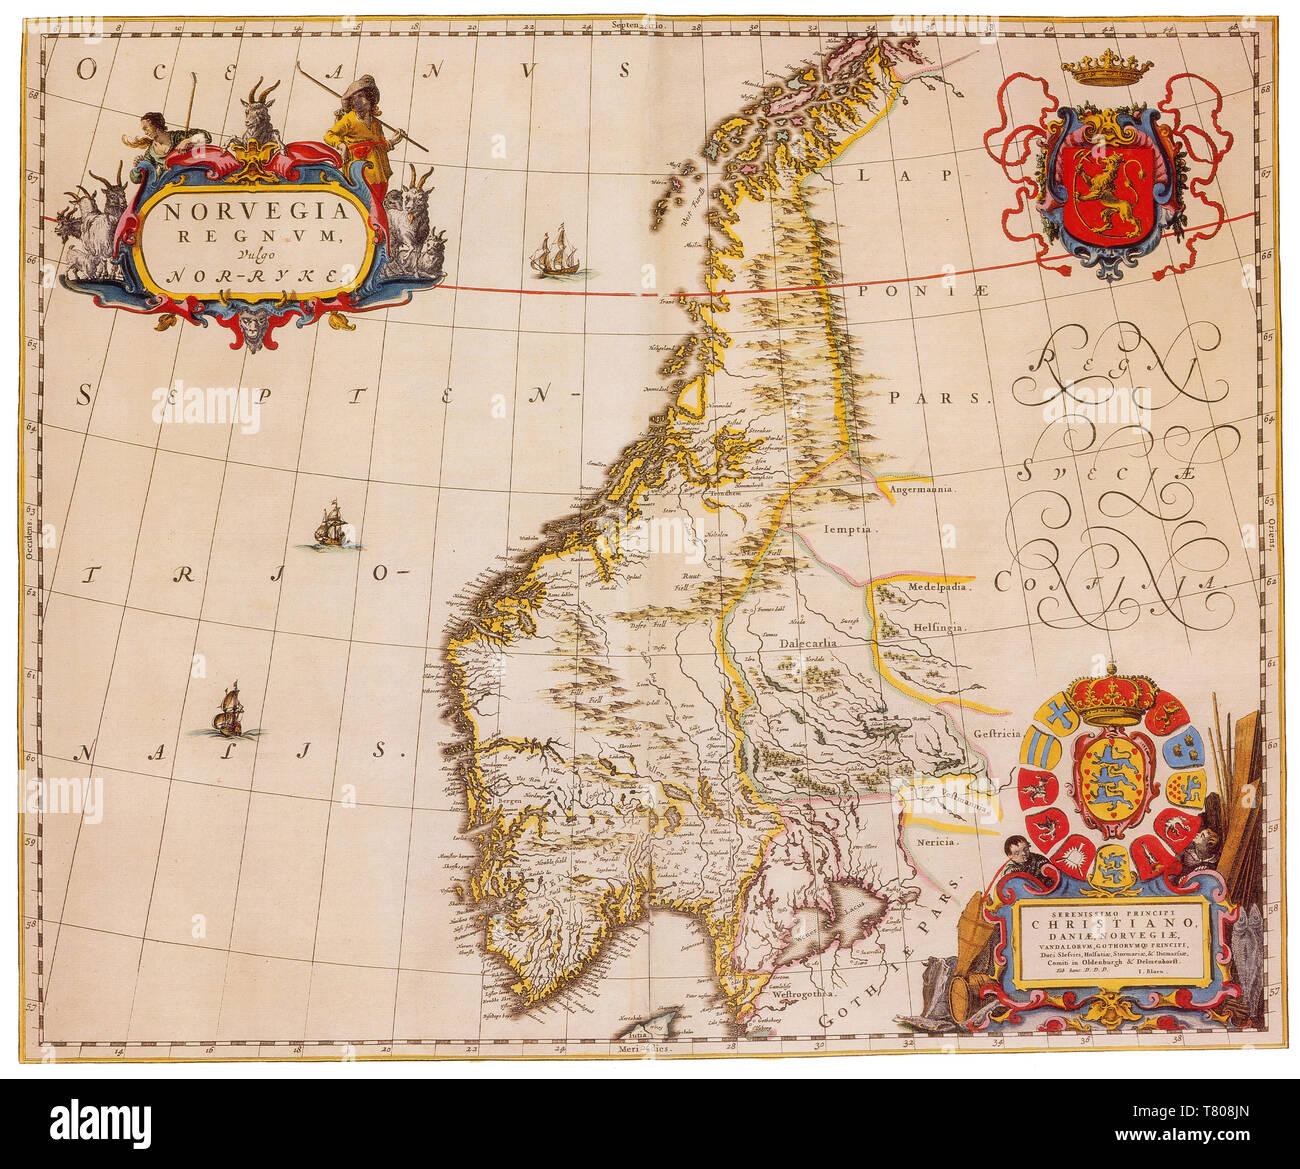 Joan Blaeu, Norway Map, 17th Century - Stock Image